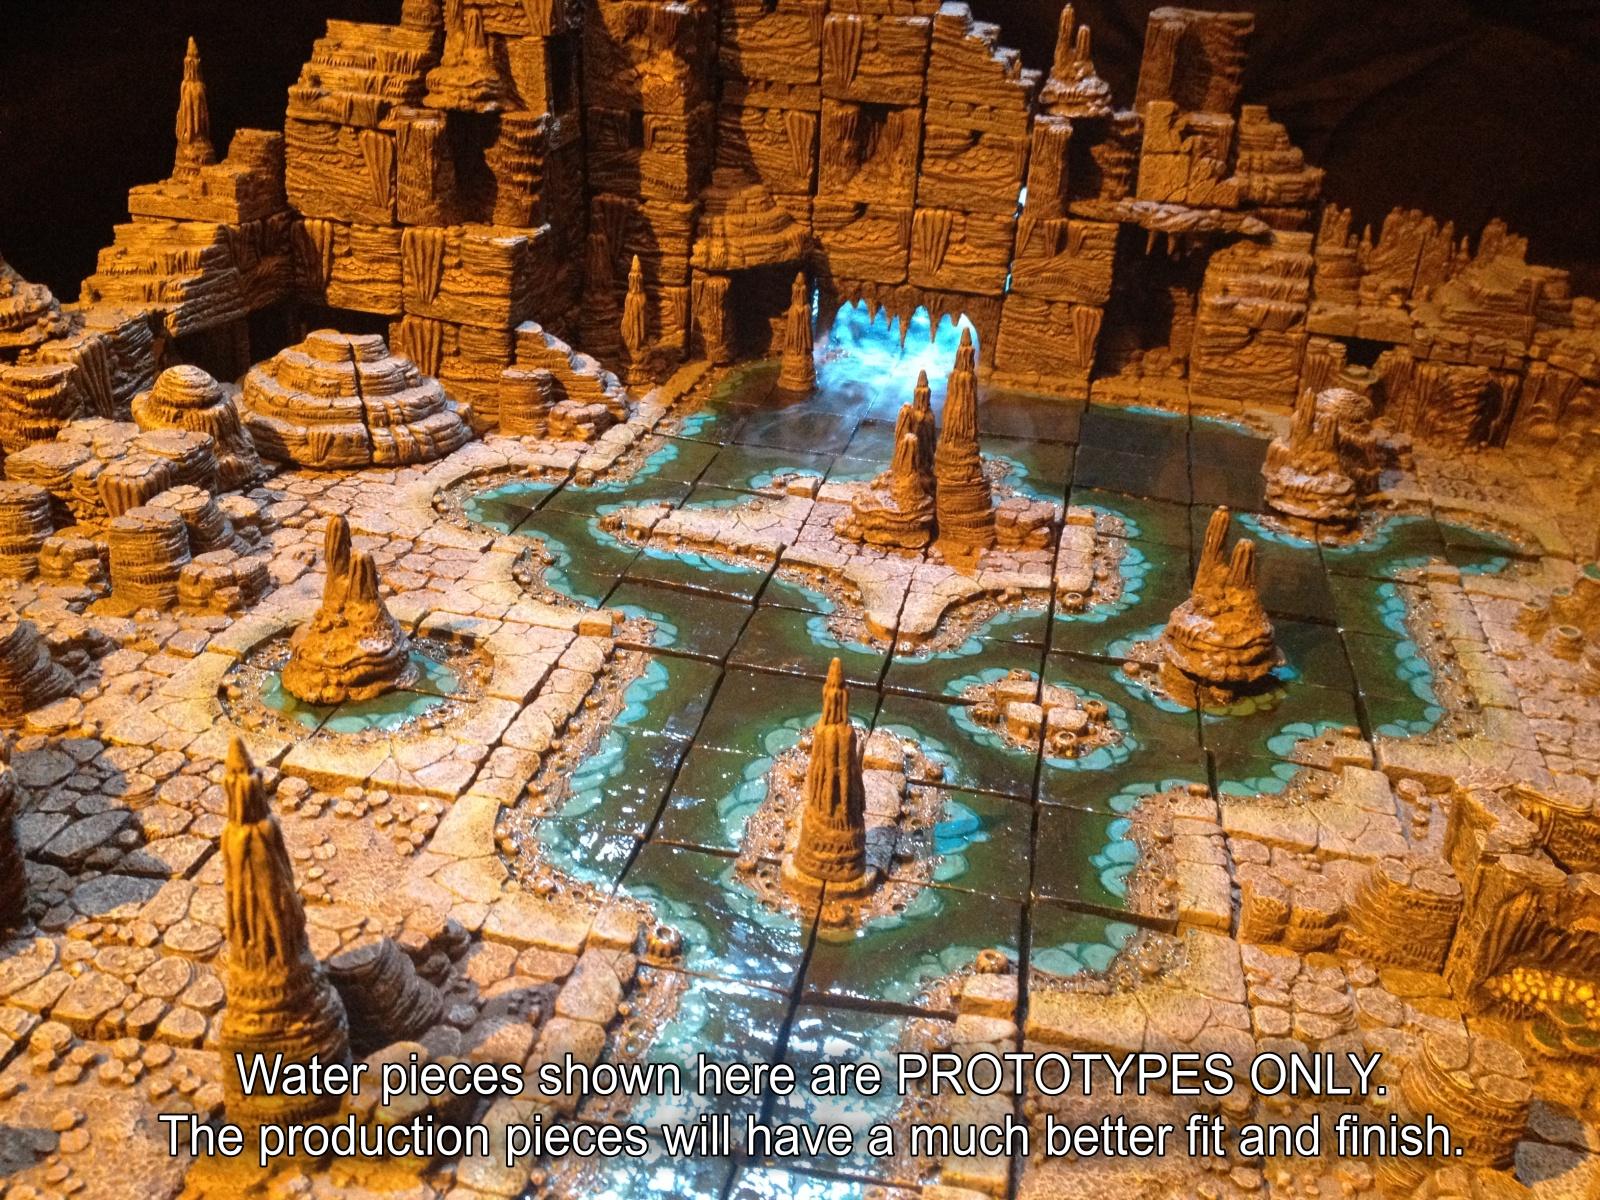 Dwarven Forge Cavern Kickstarter in its Final Wek